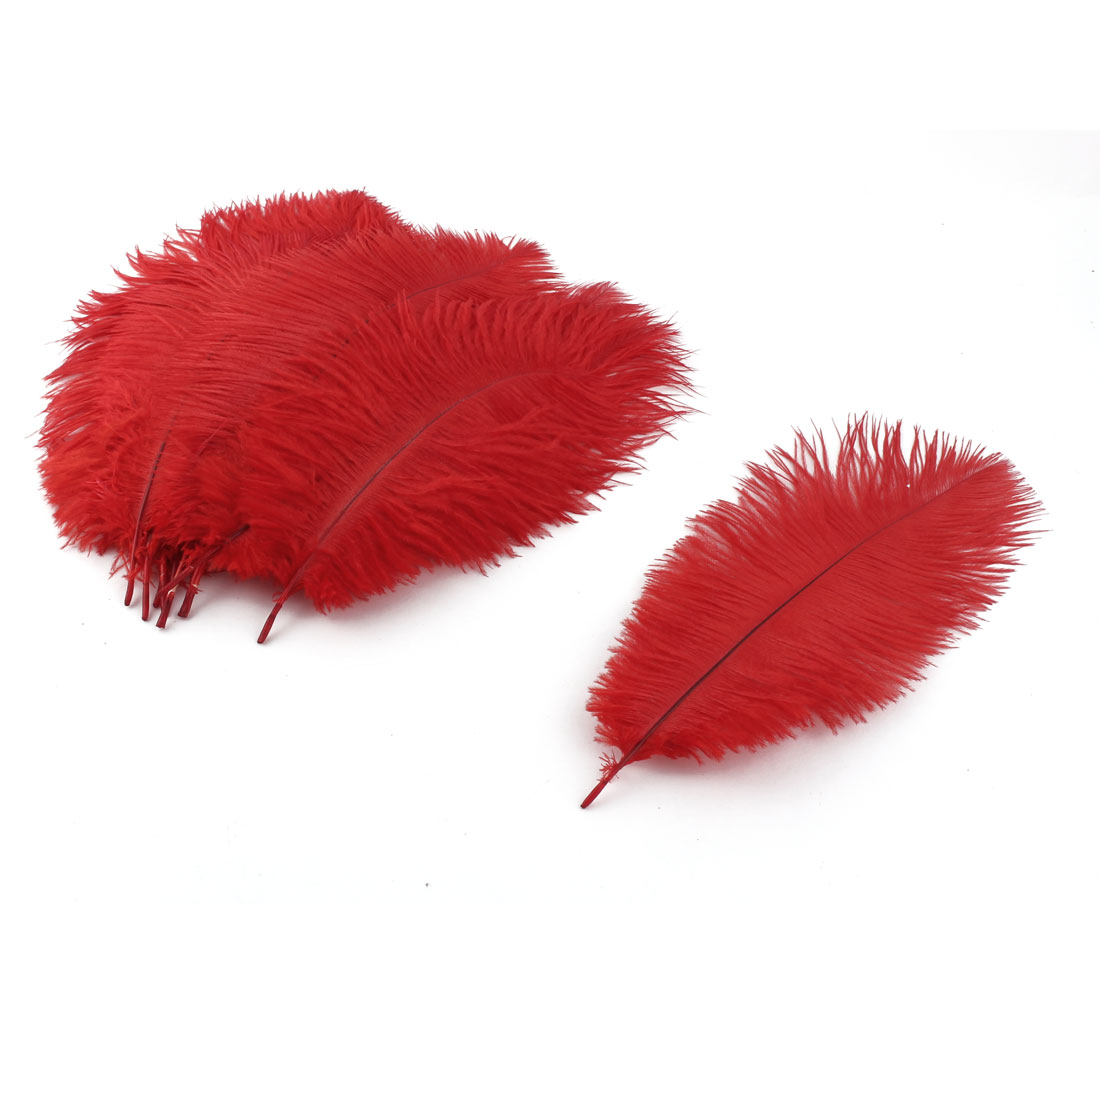 Wedding Party Clothes DIY Decor Ostrich Feathers Plume Red 20-25cm Length 10pcs